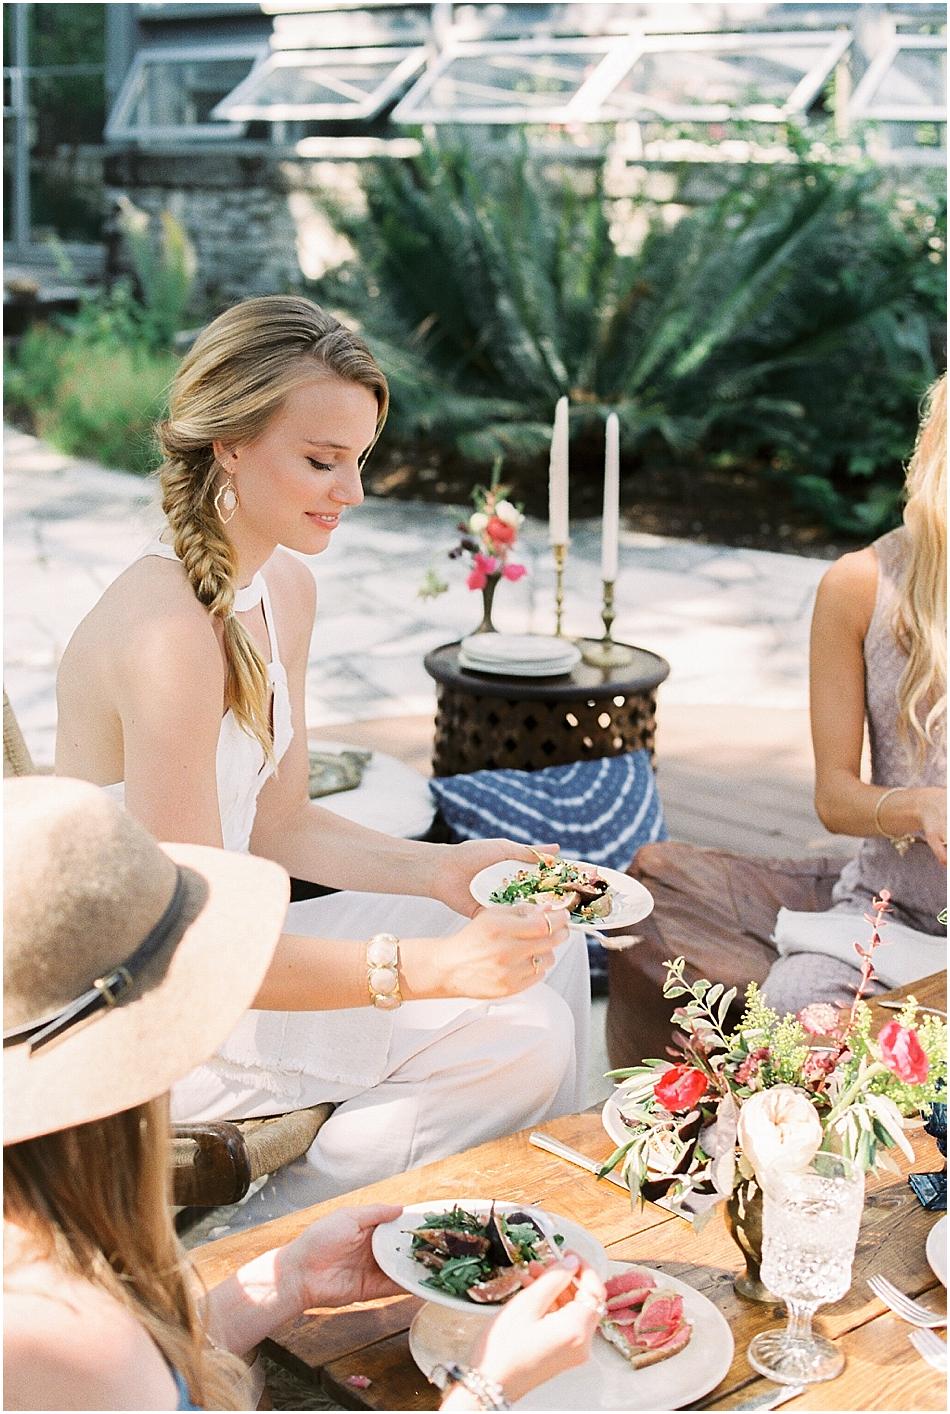 Emilie Anne Photography | Brides of Austin | Catering | Film | ATX-27.jpg